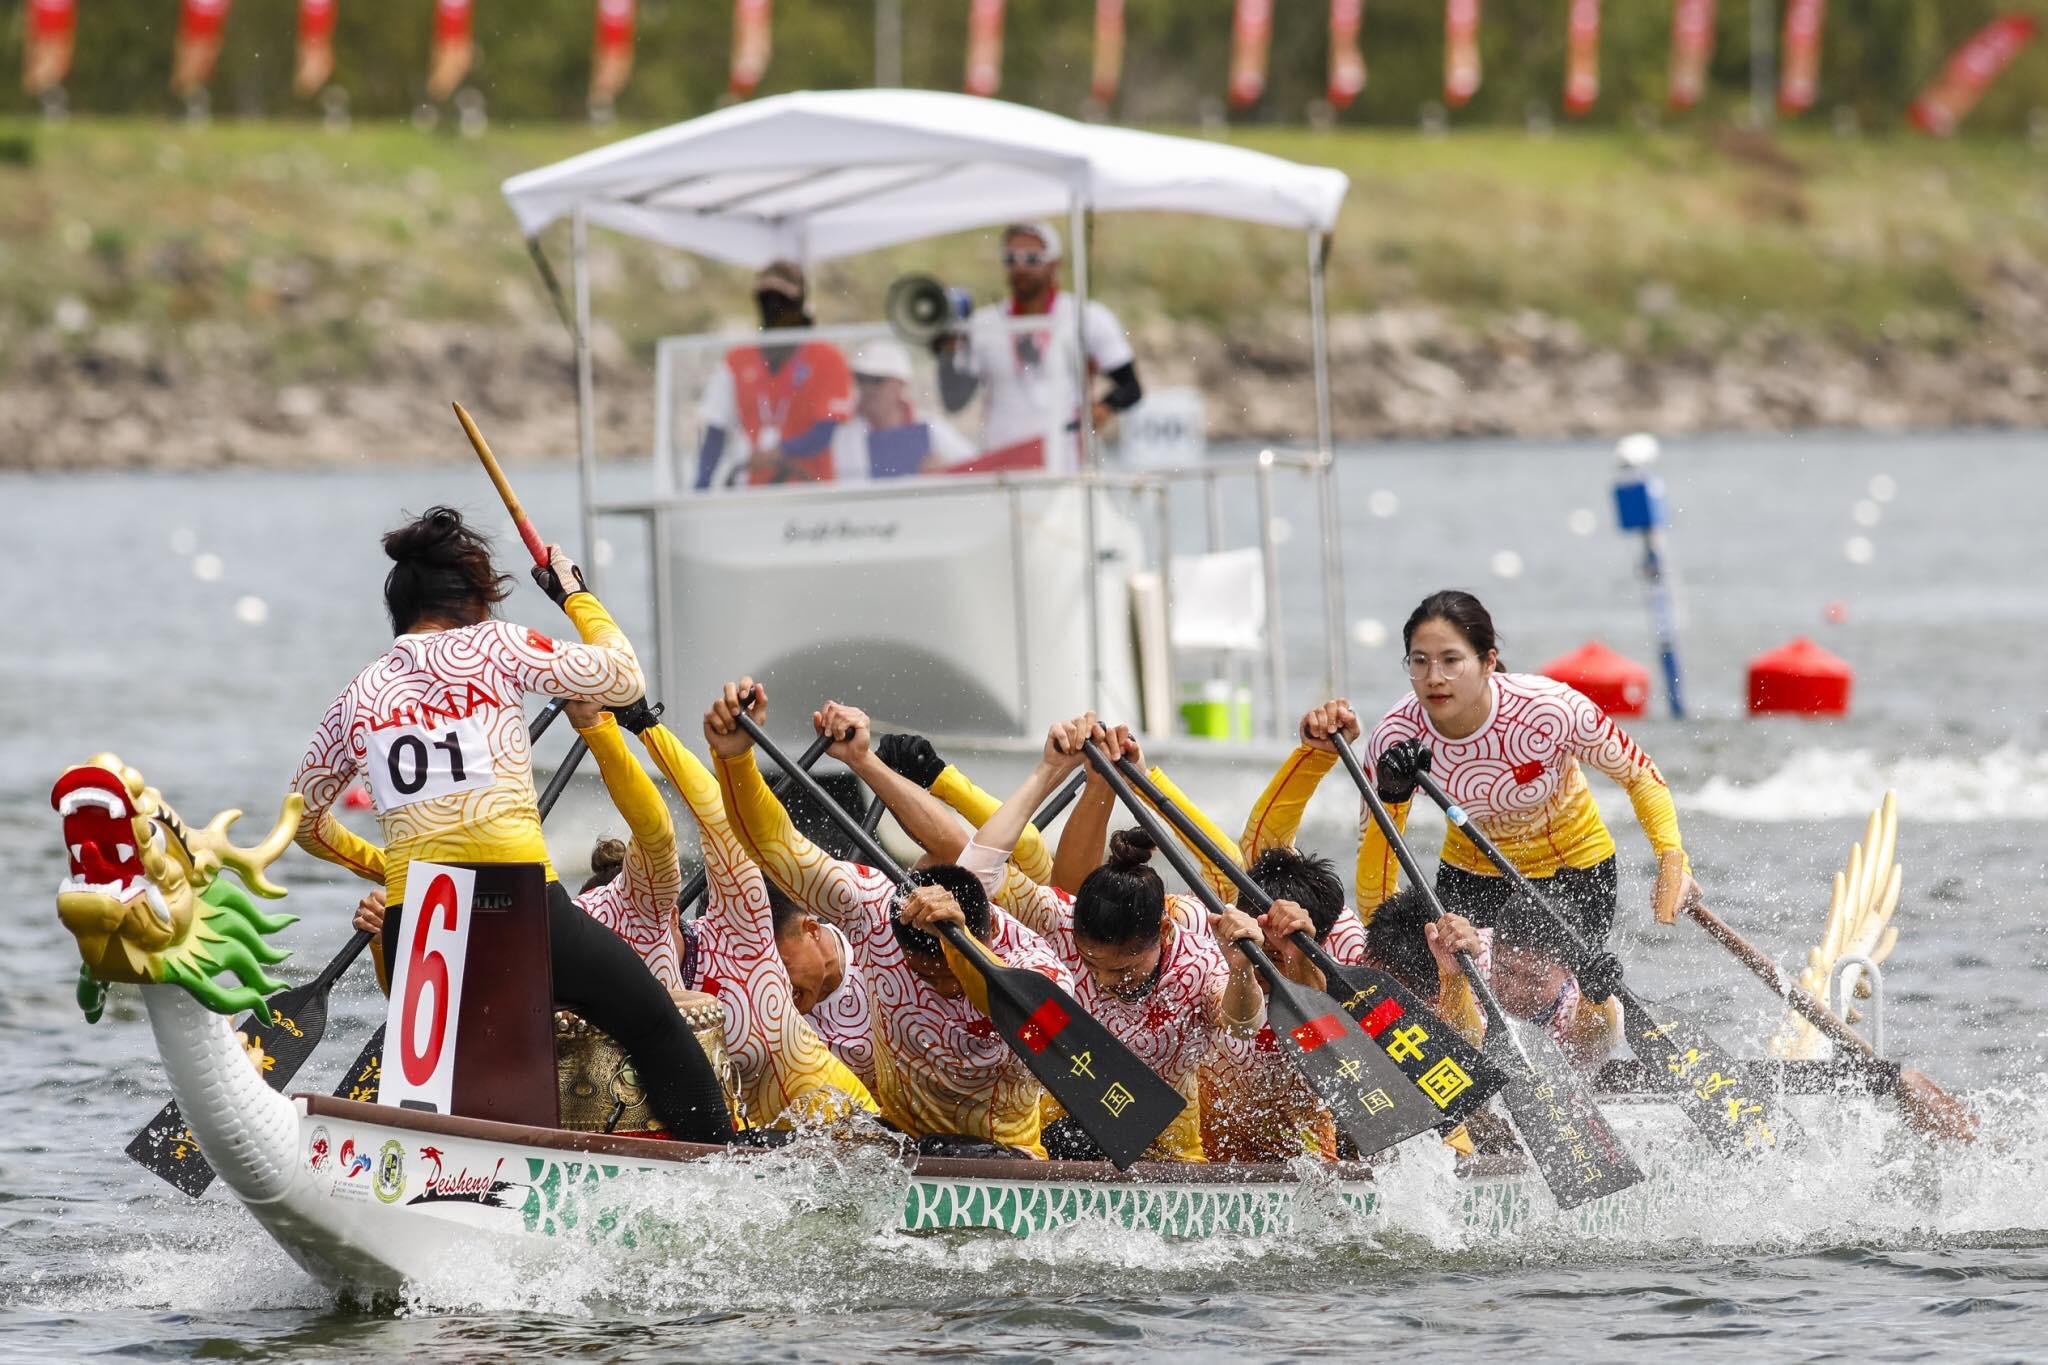 China break world record on last day of World Dragon Boat Racing Championships